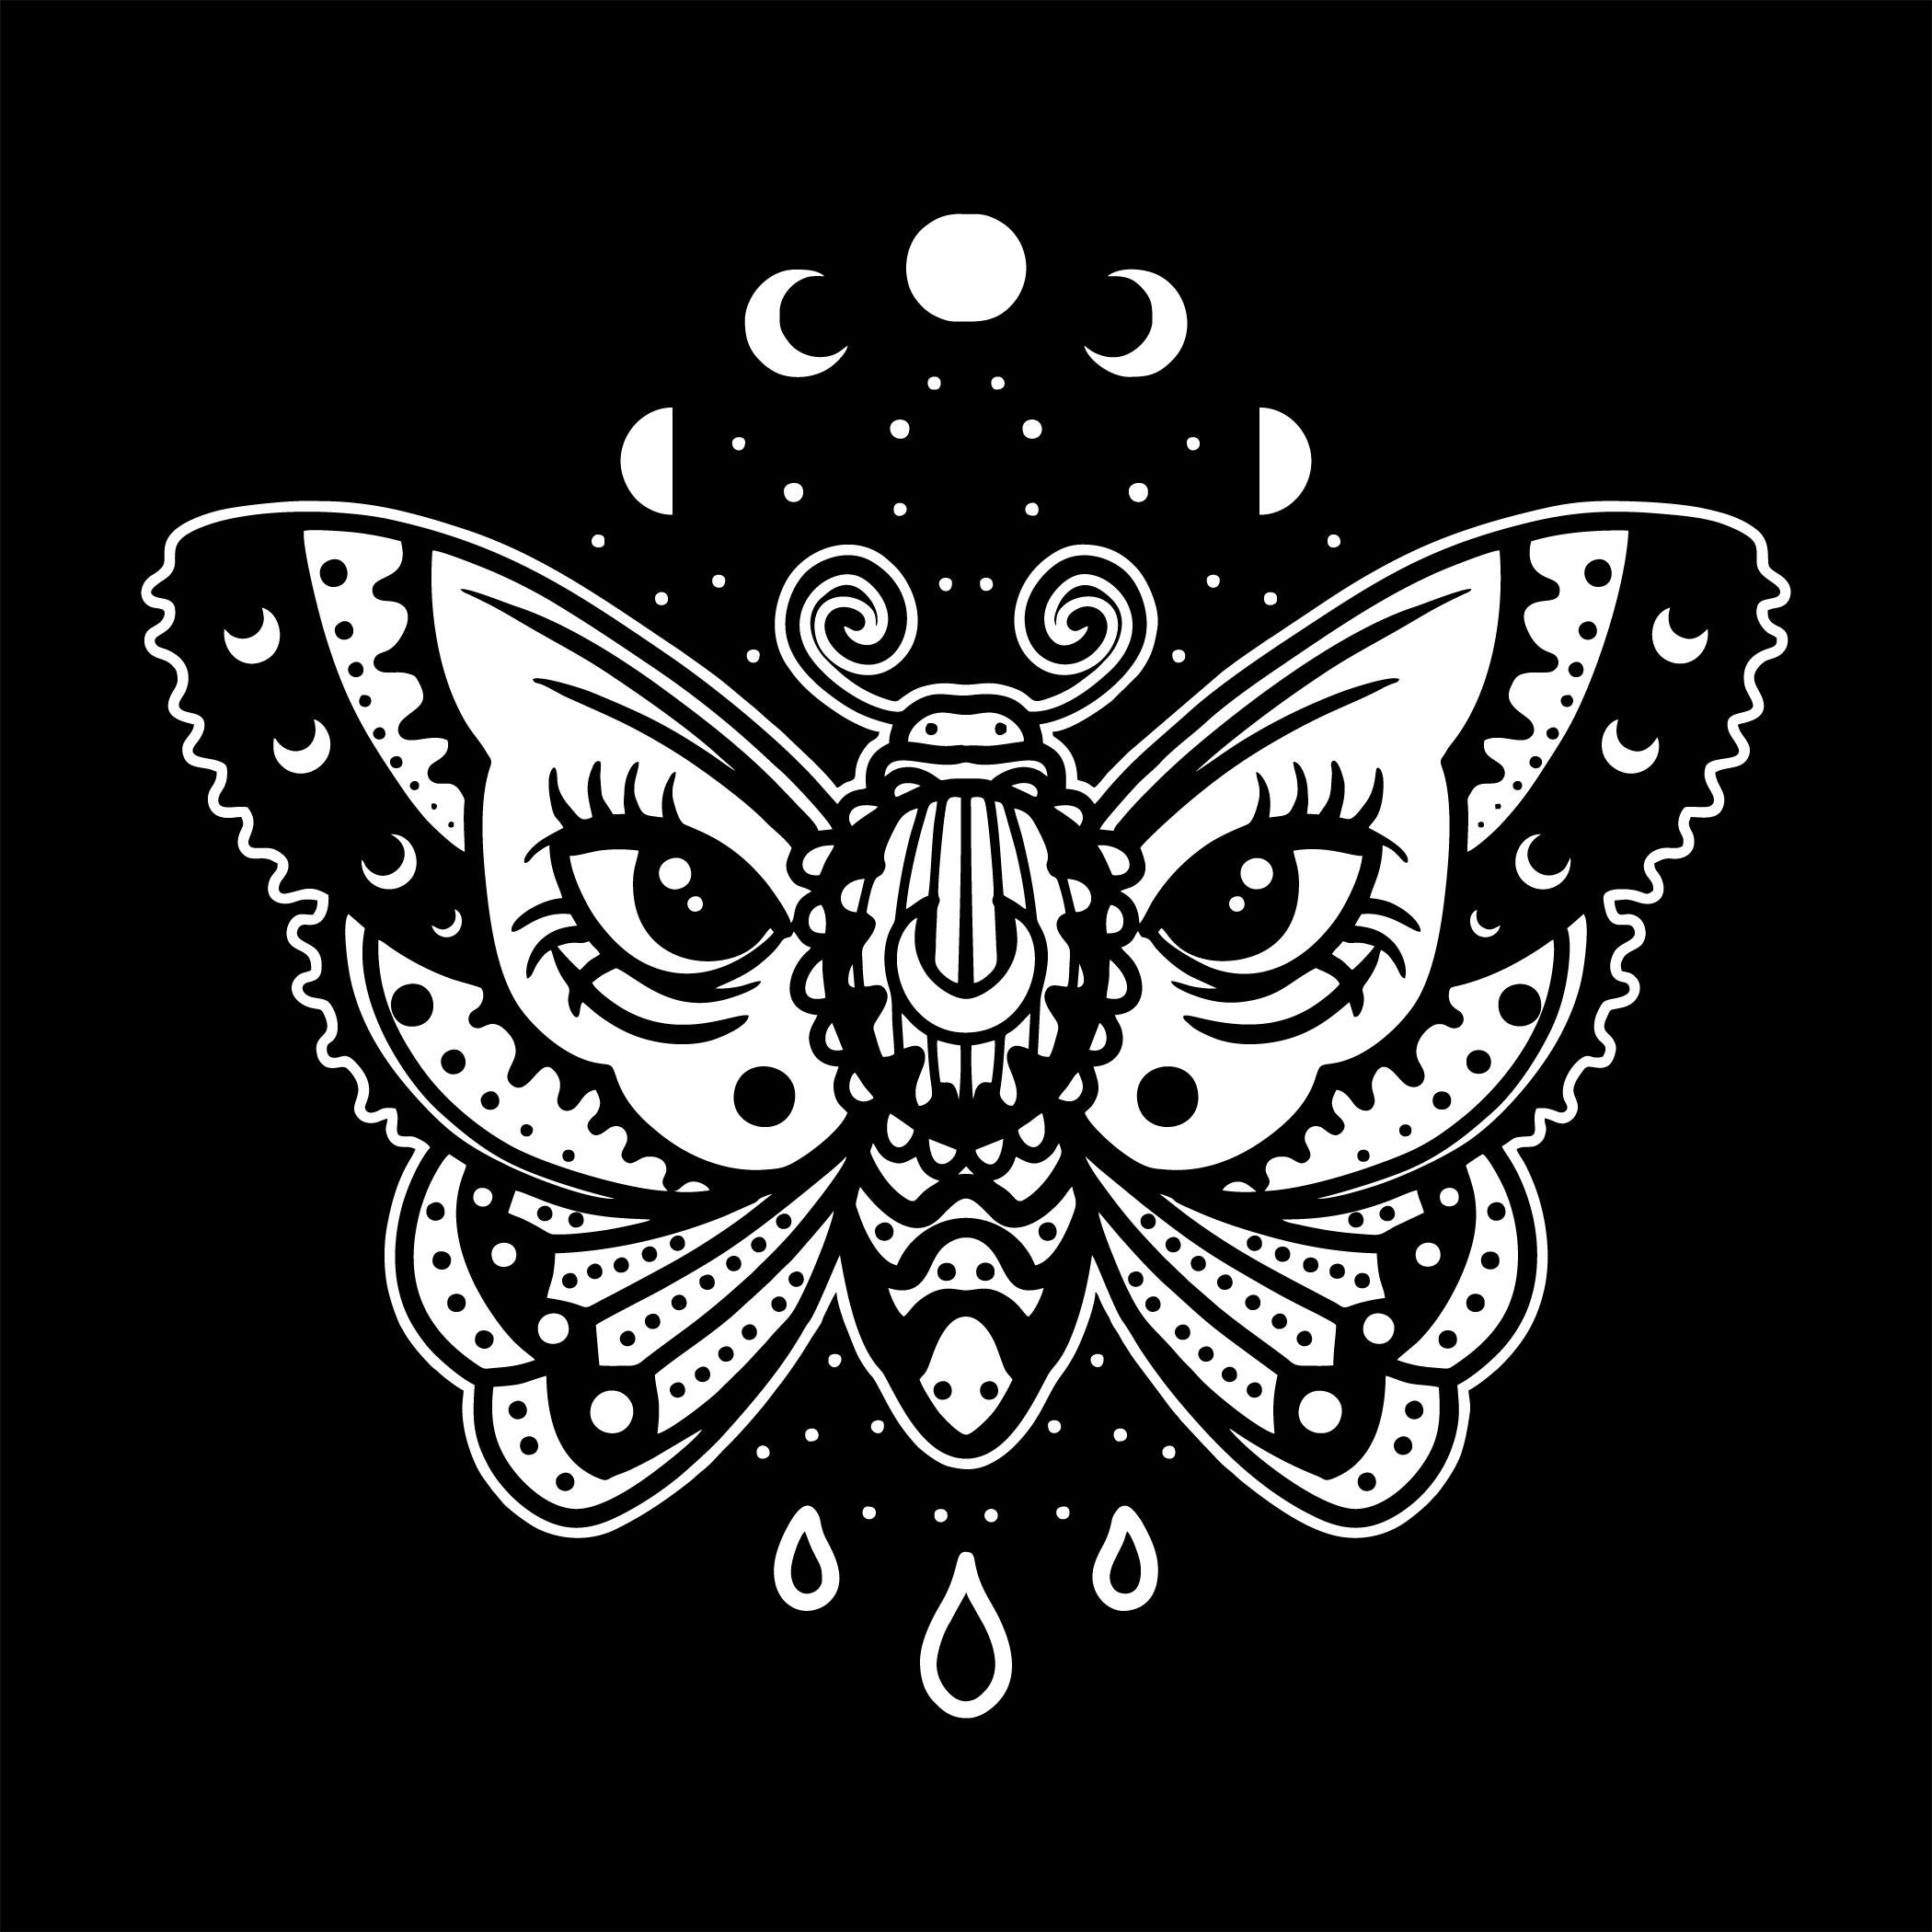 tatuaje de polilla nocturna